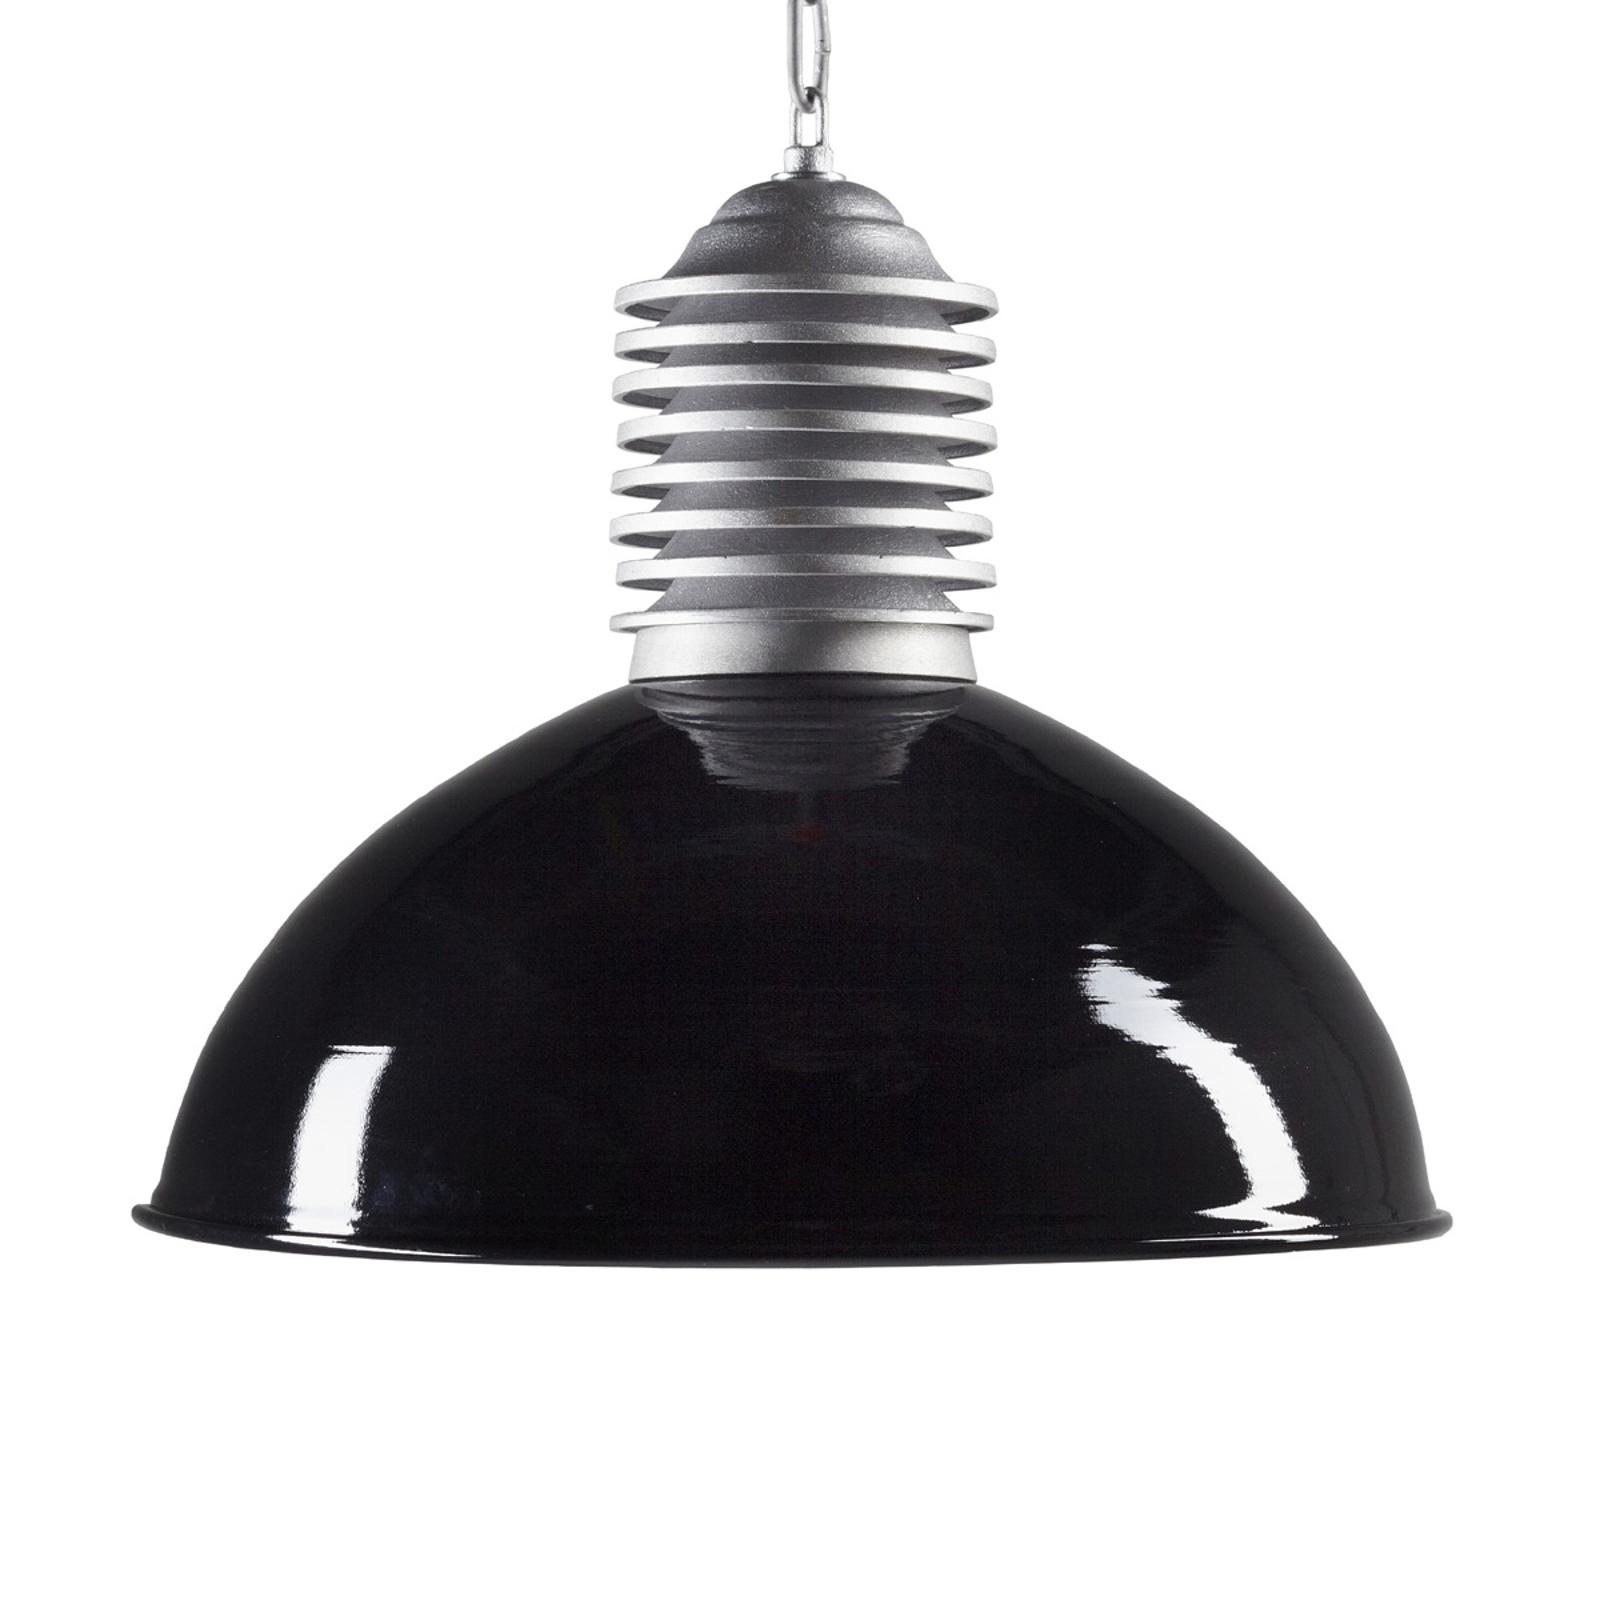 Utomhushänglampa Carla aluminium/svart